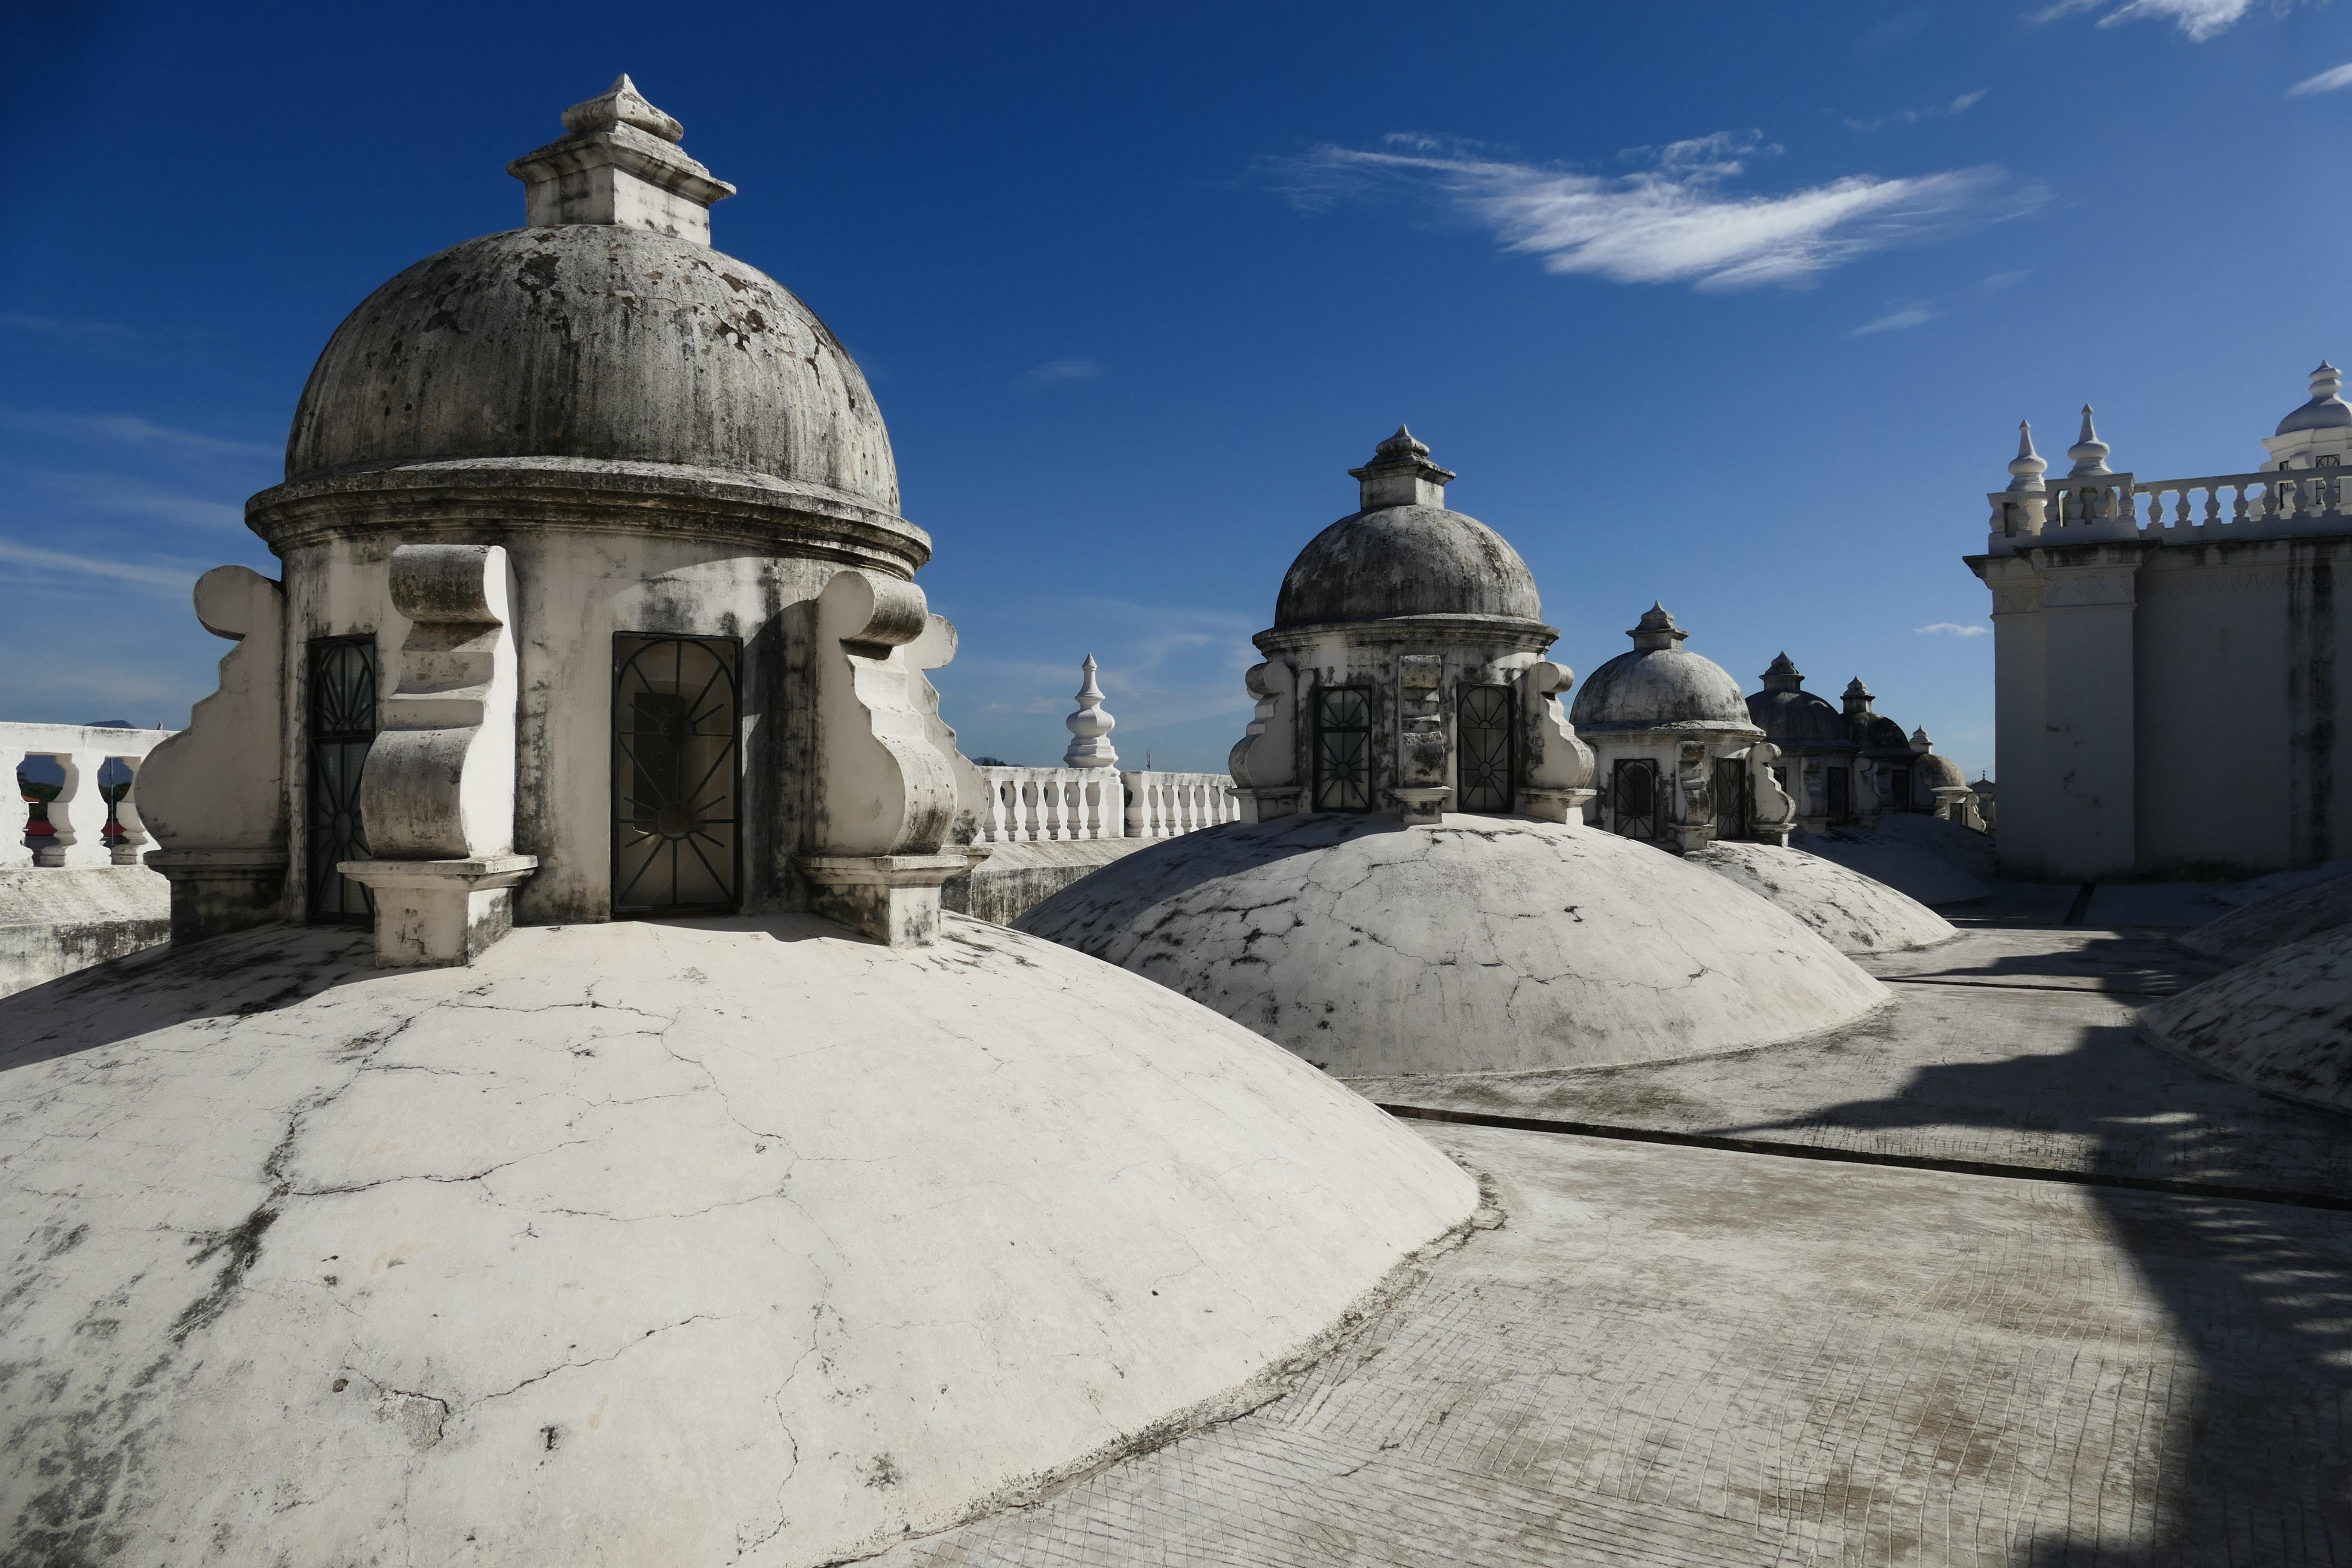 Nicaragua leon cathedral roof c emma pura aventura